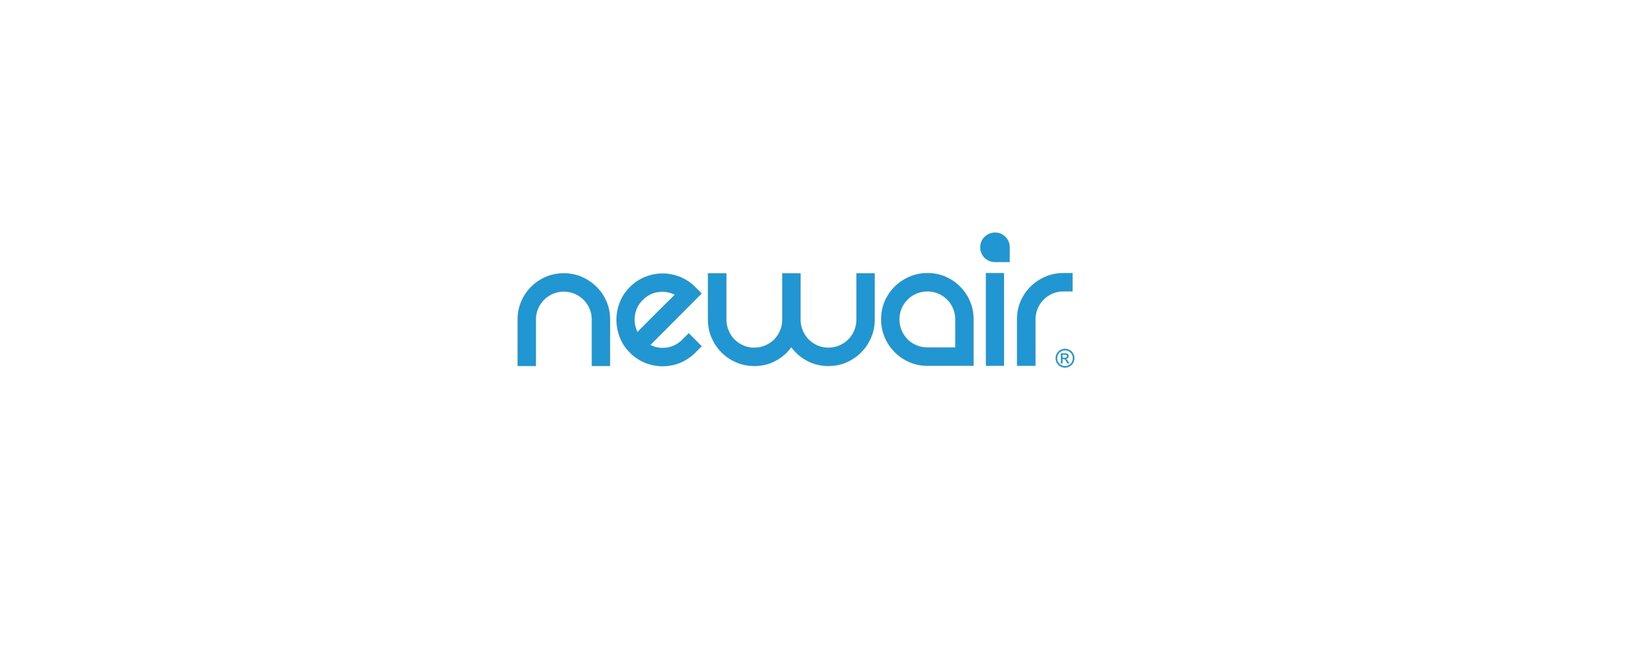 NewAir Discount Code 2021